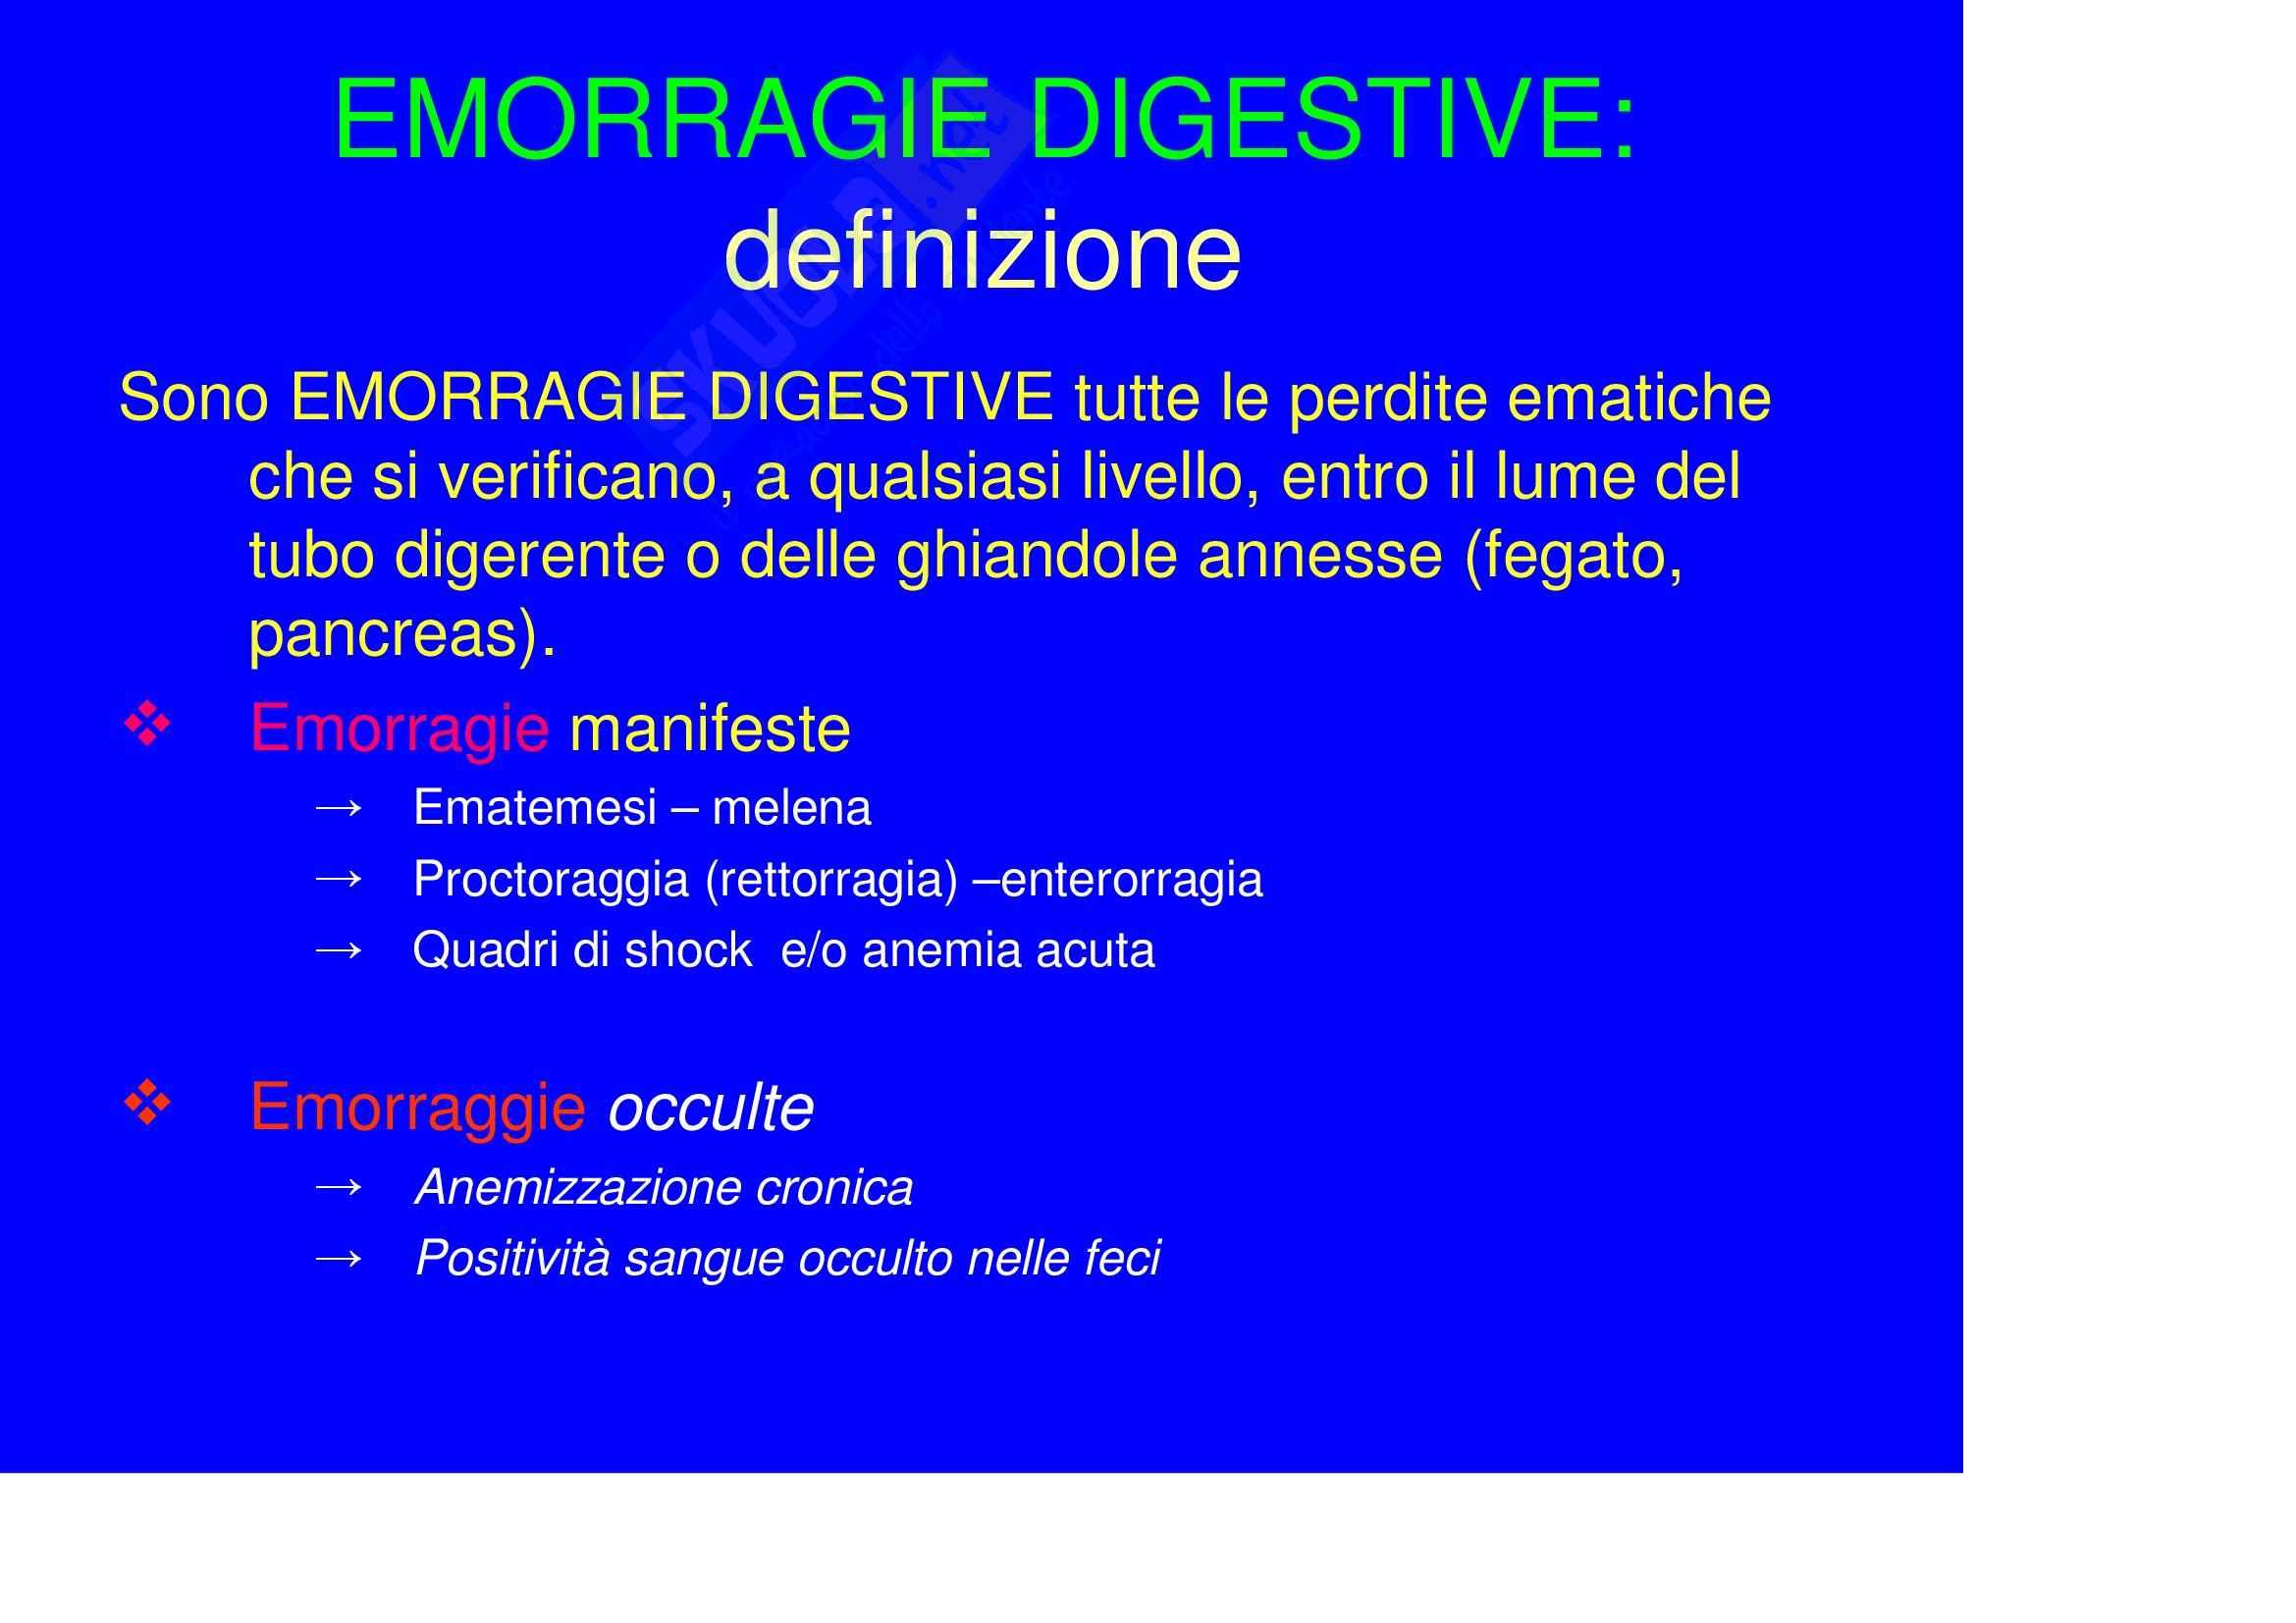 Chirurgia generale - le emorragie digestive Pag. 2